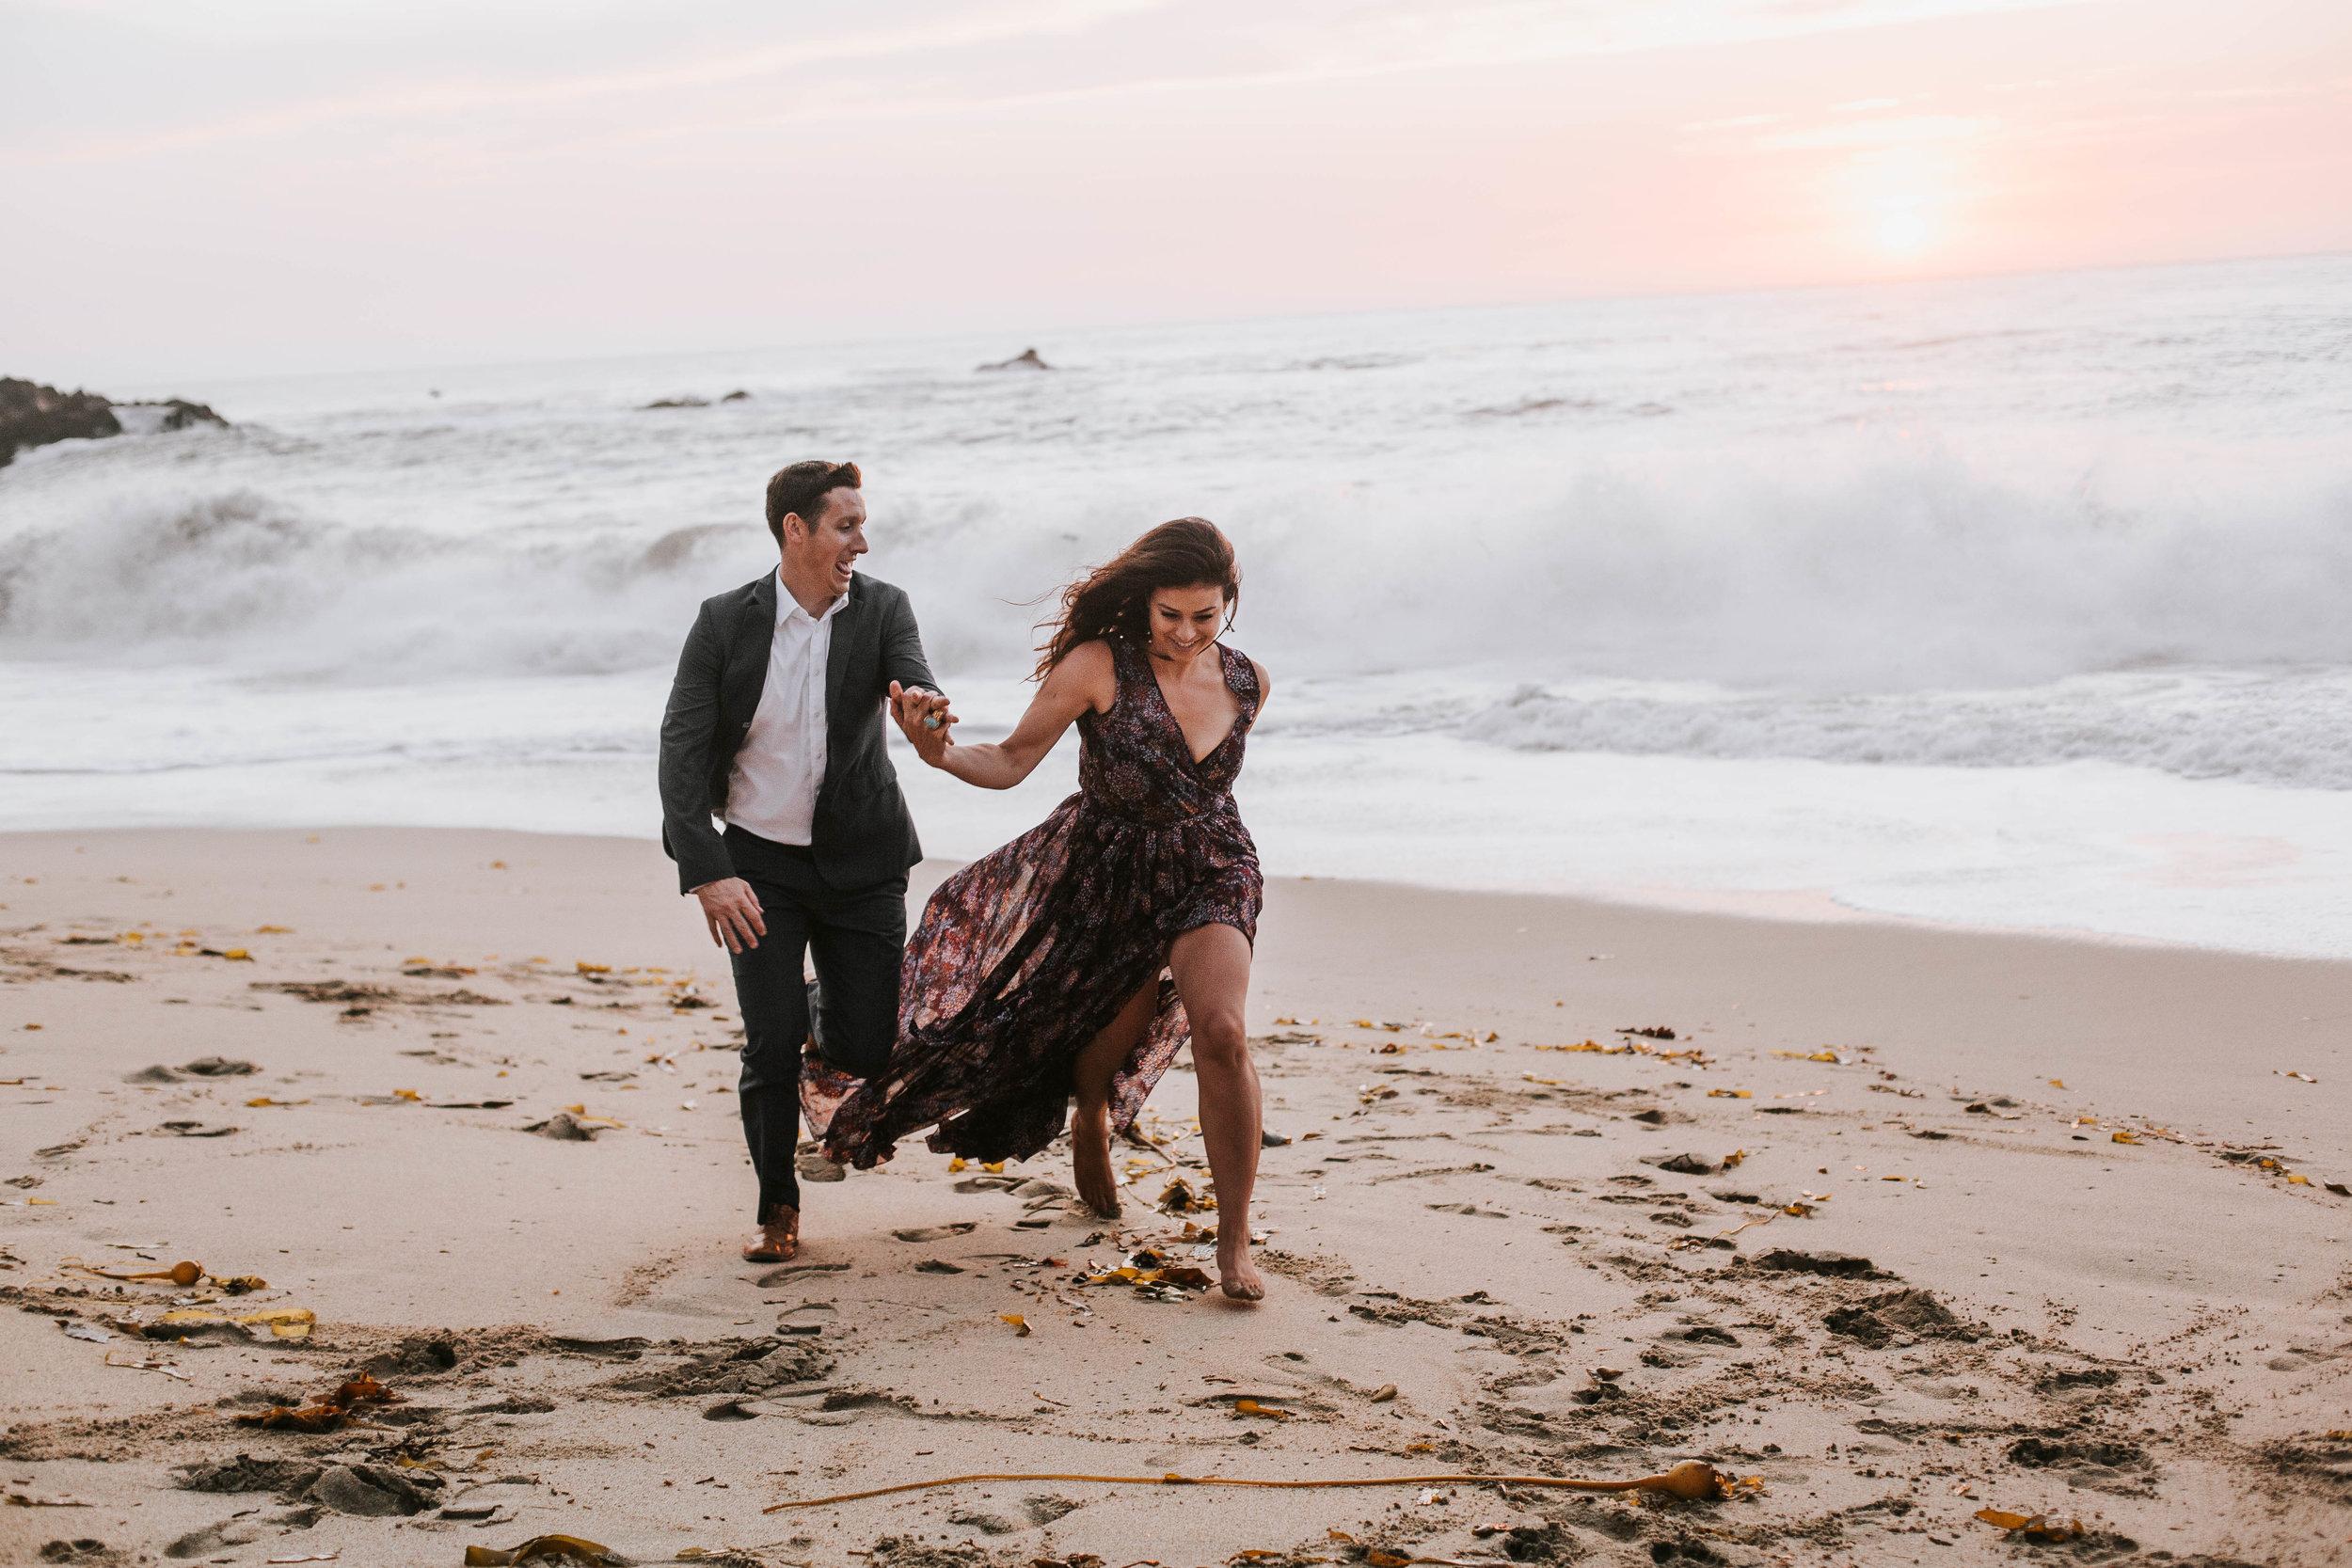 nicole-daacke-photography-big-sur-california-coast-adventure-engagement-photos-adventurous-elopement-intimate-wedding-photographer-golden-coastal-cali-engagement-session-27.jpg